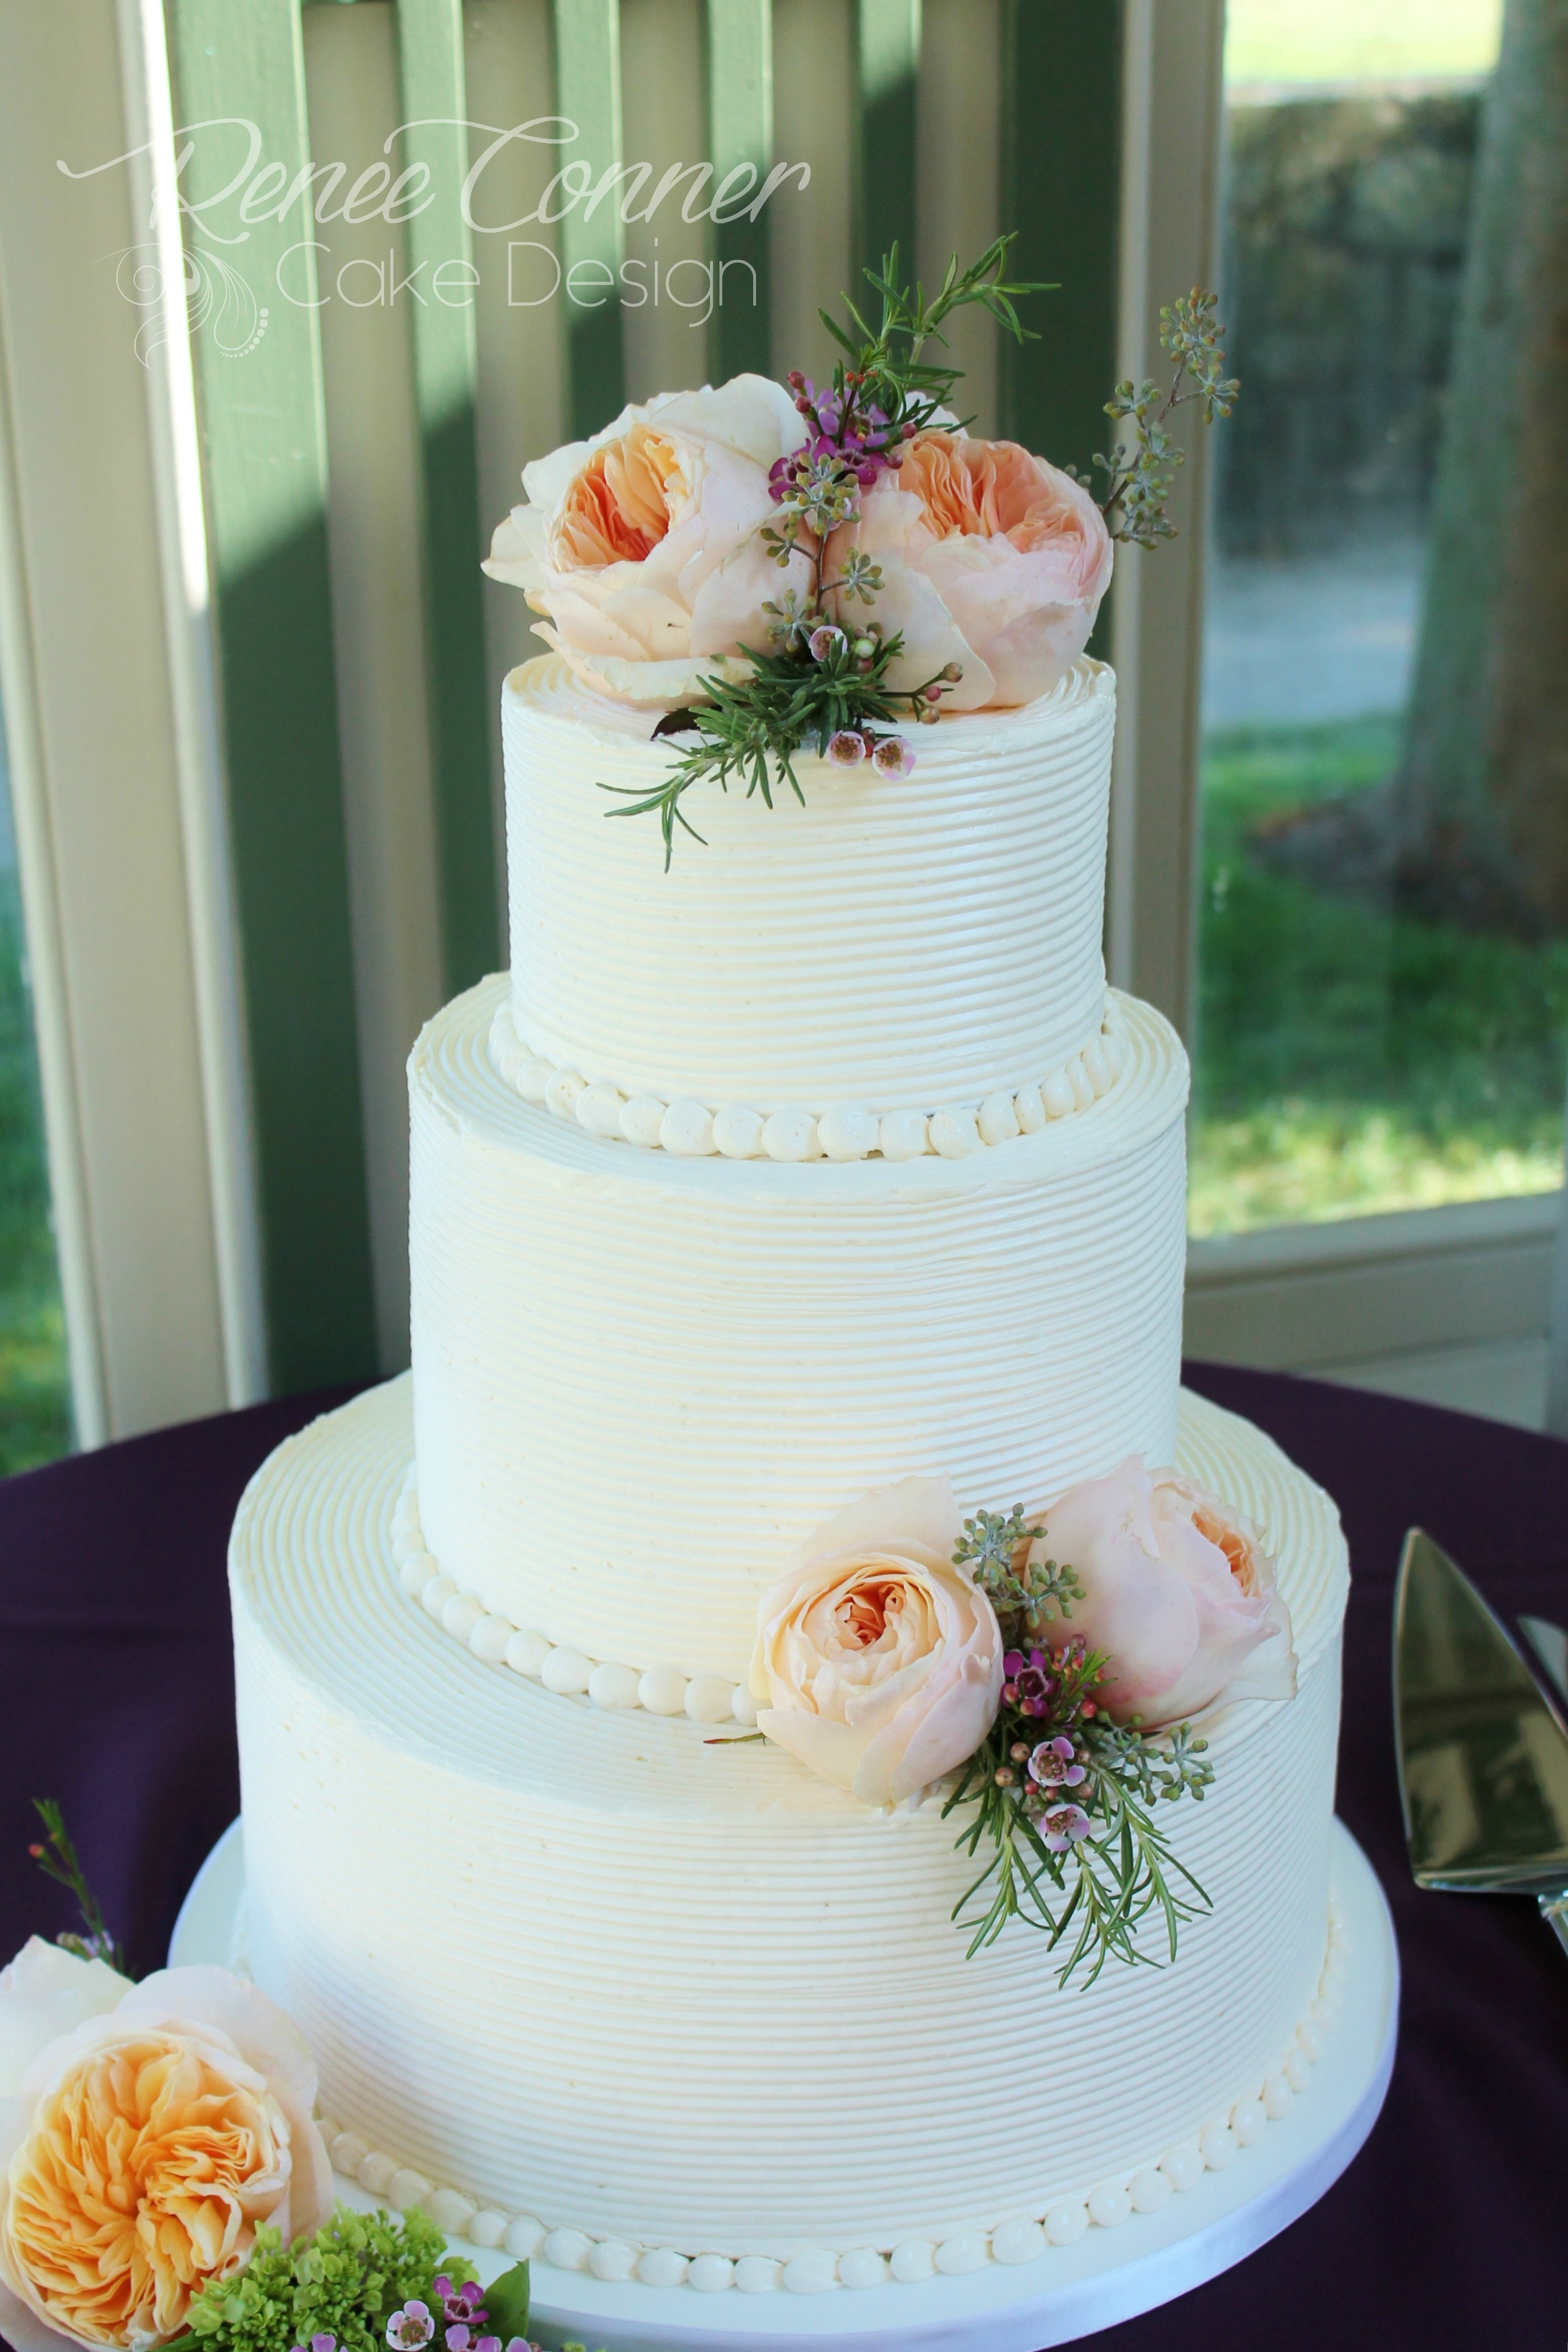 Gallery – Renee Conner Cake Design